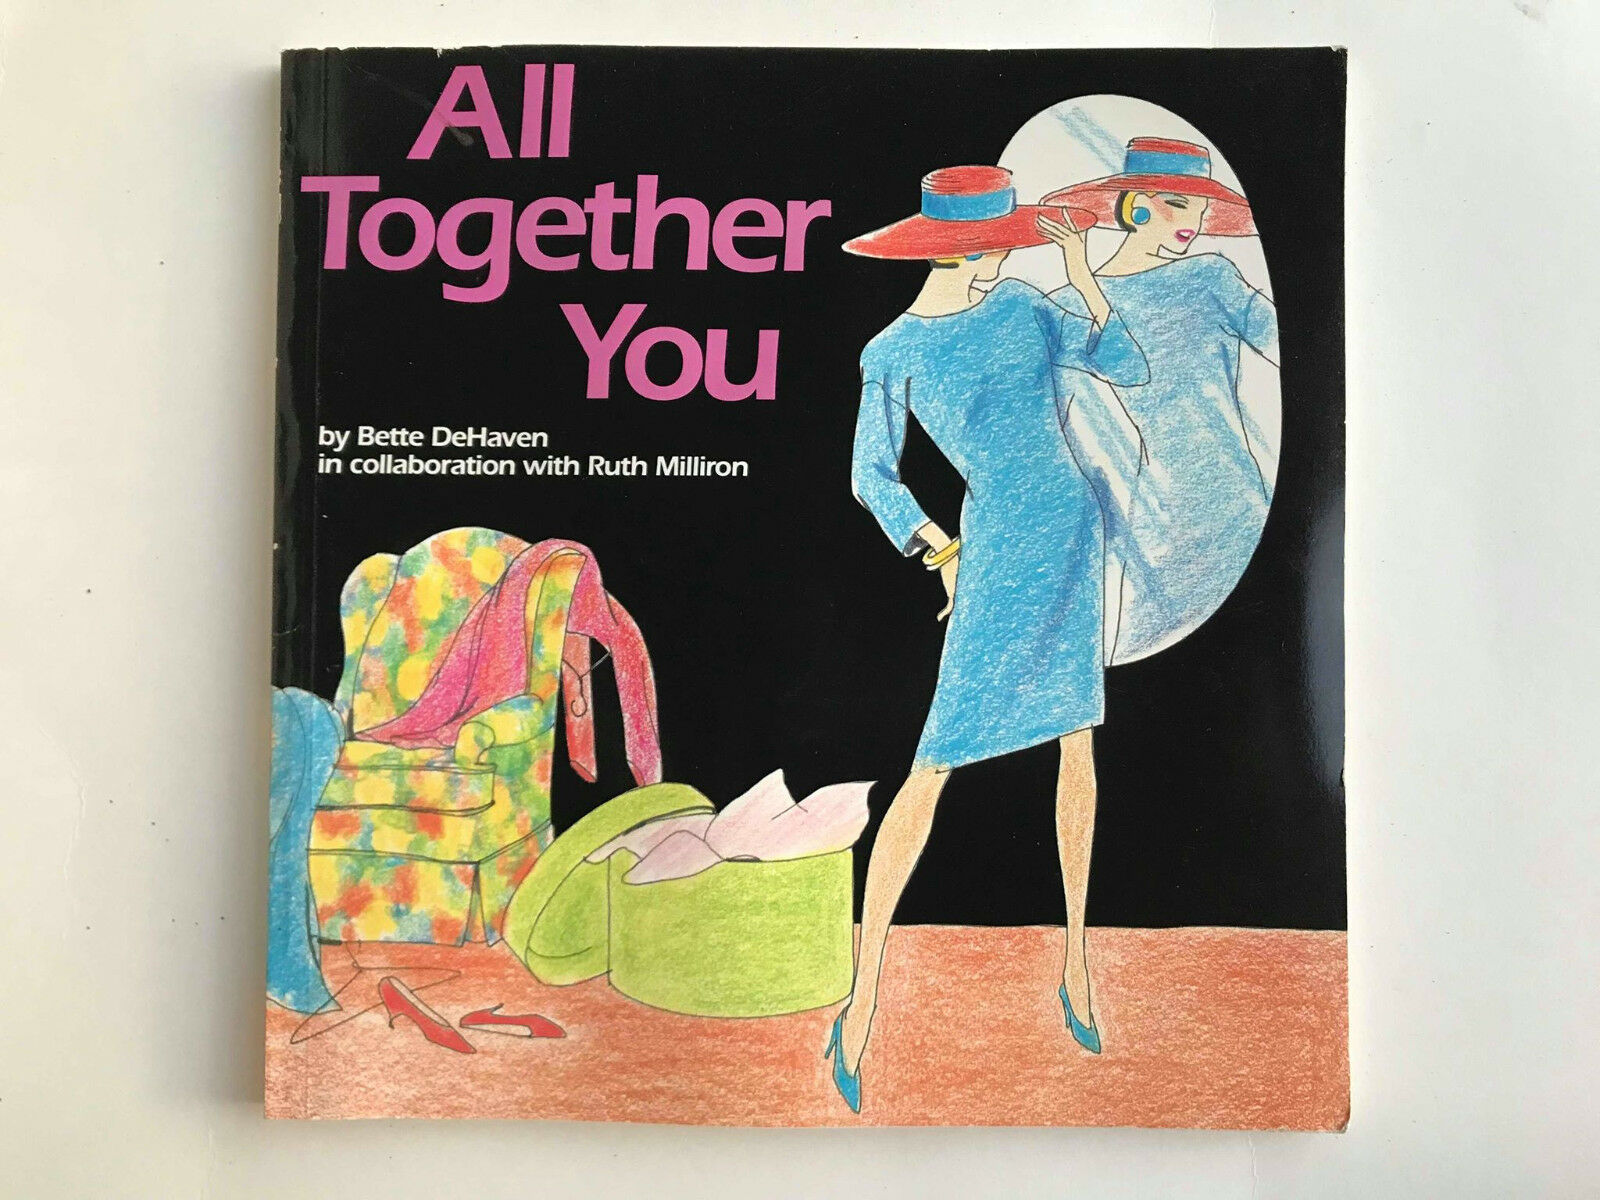 tutti Together You By Bette Dehaven en Colaboración con Ruth Milliron BK347 Pb